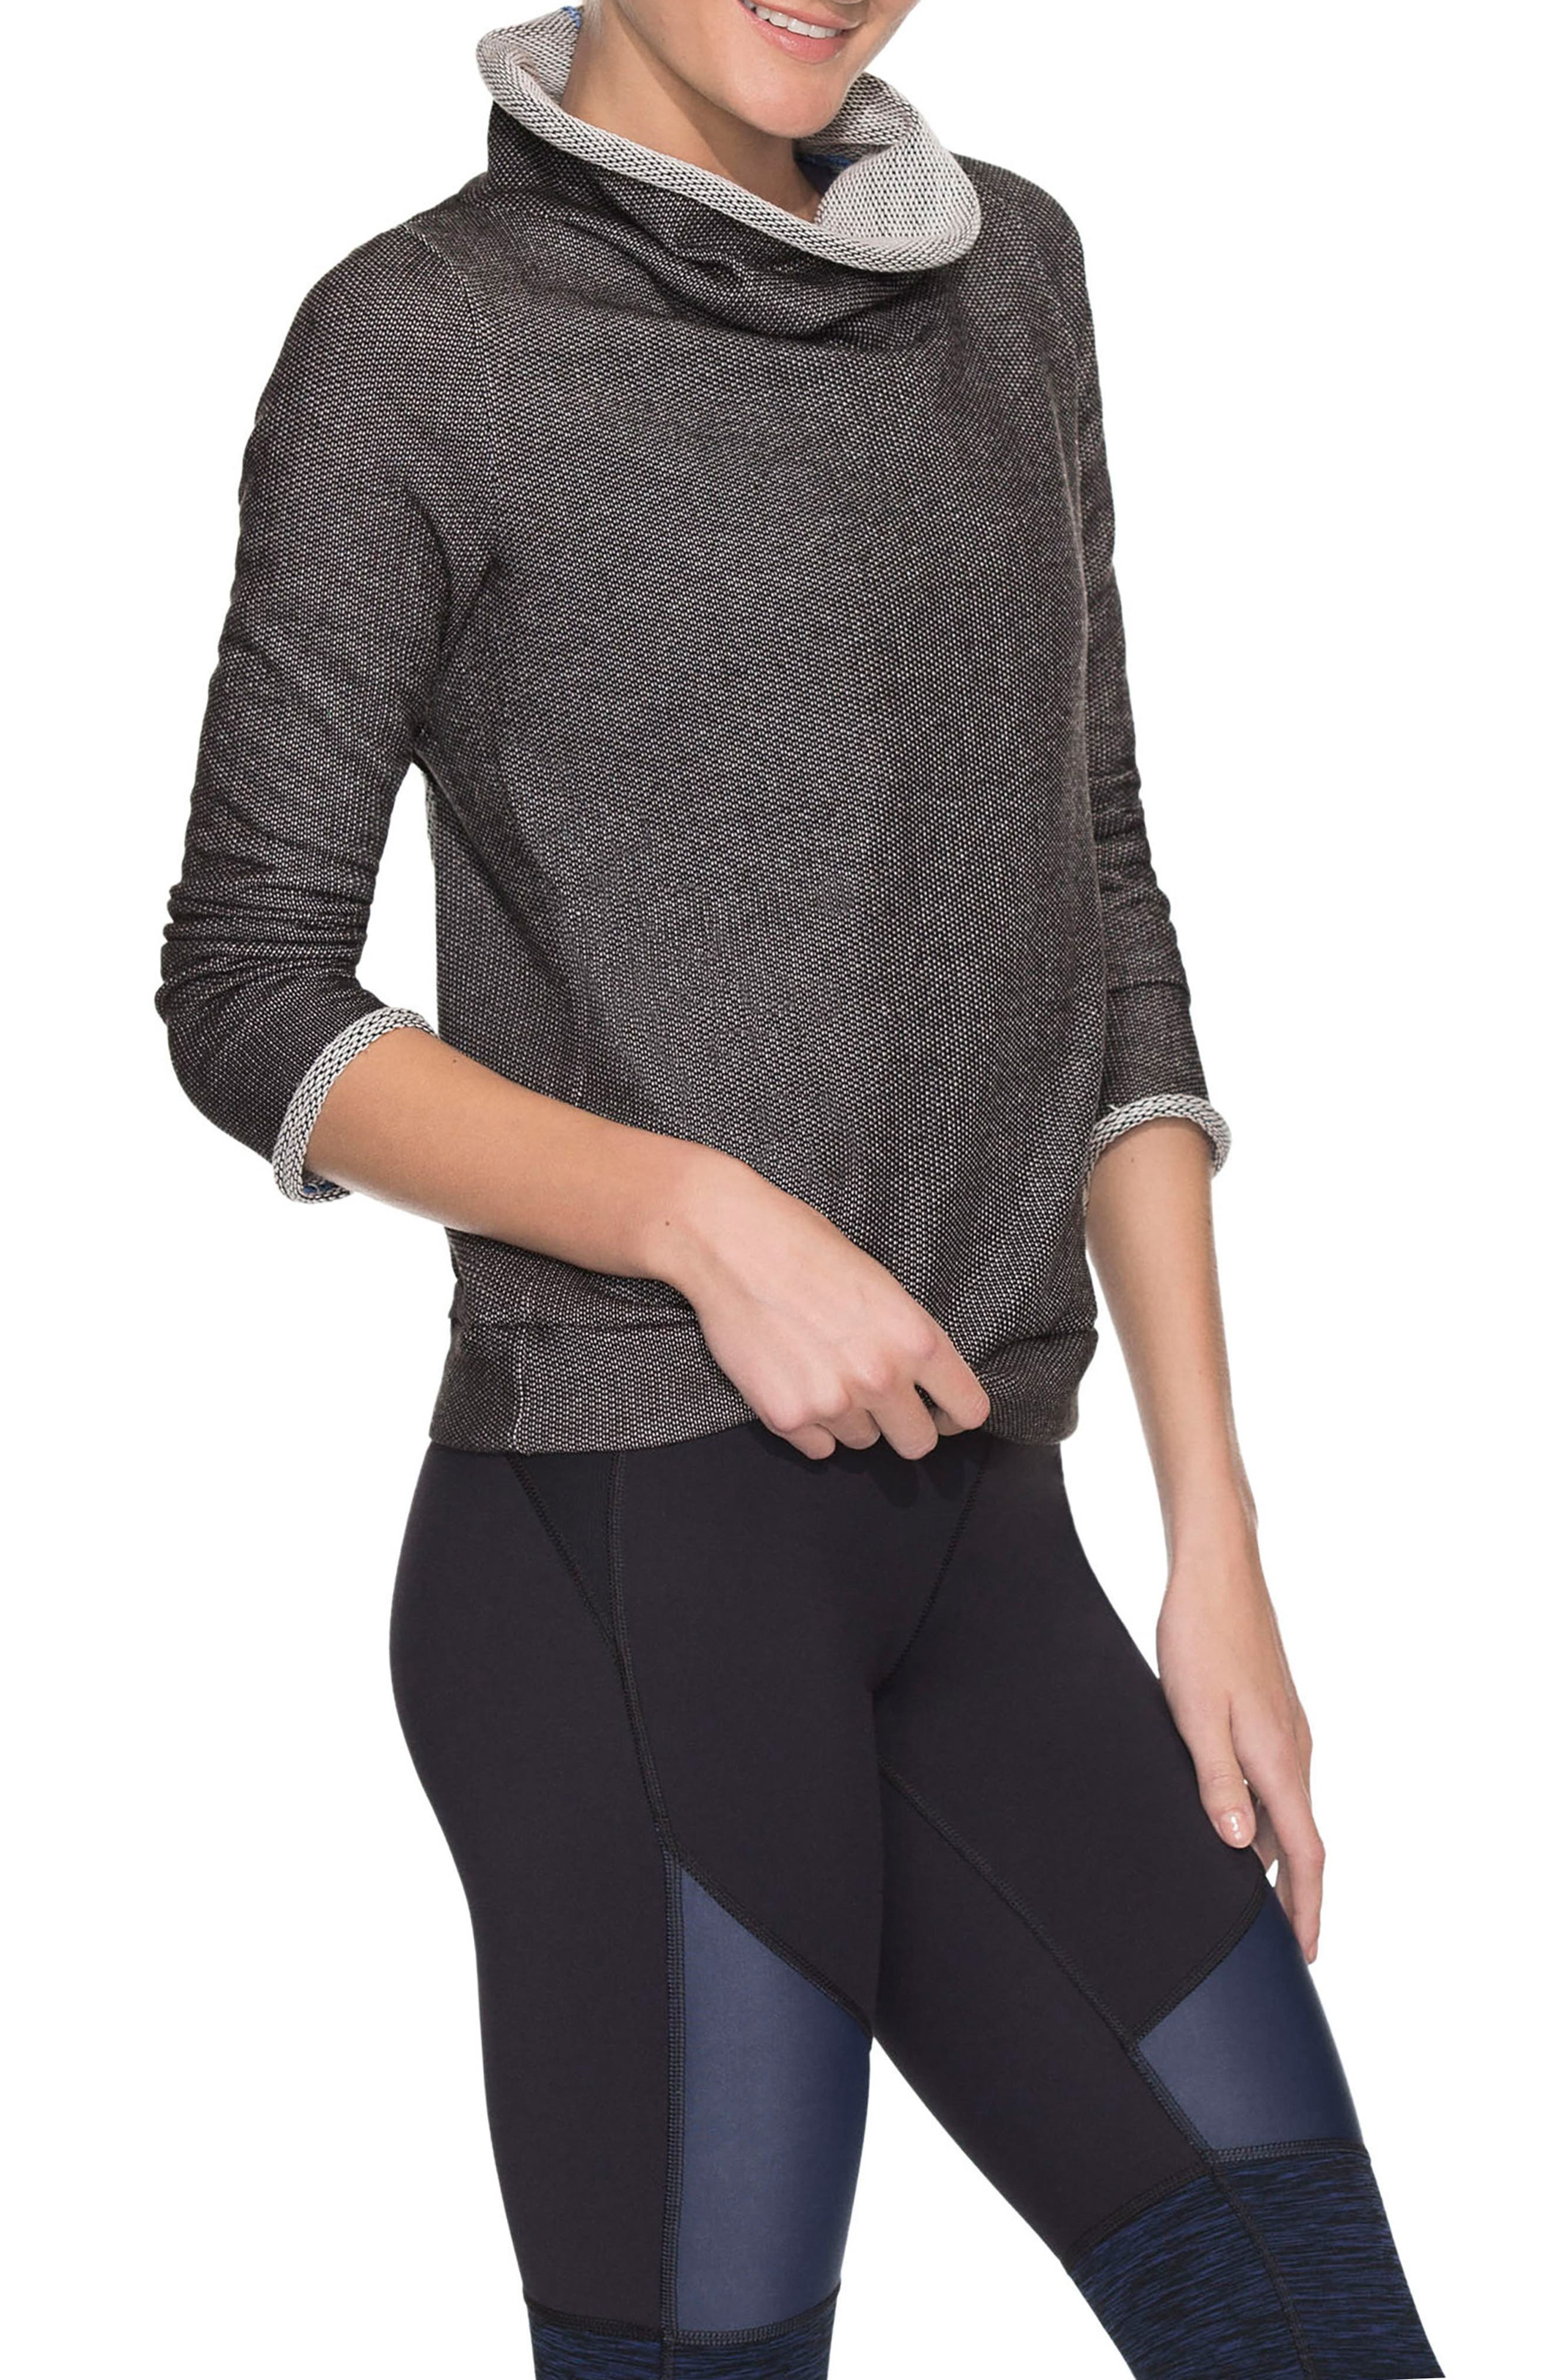 Cloudburst Sweatshirt,                             Main thumbnail 1, color,                             Black